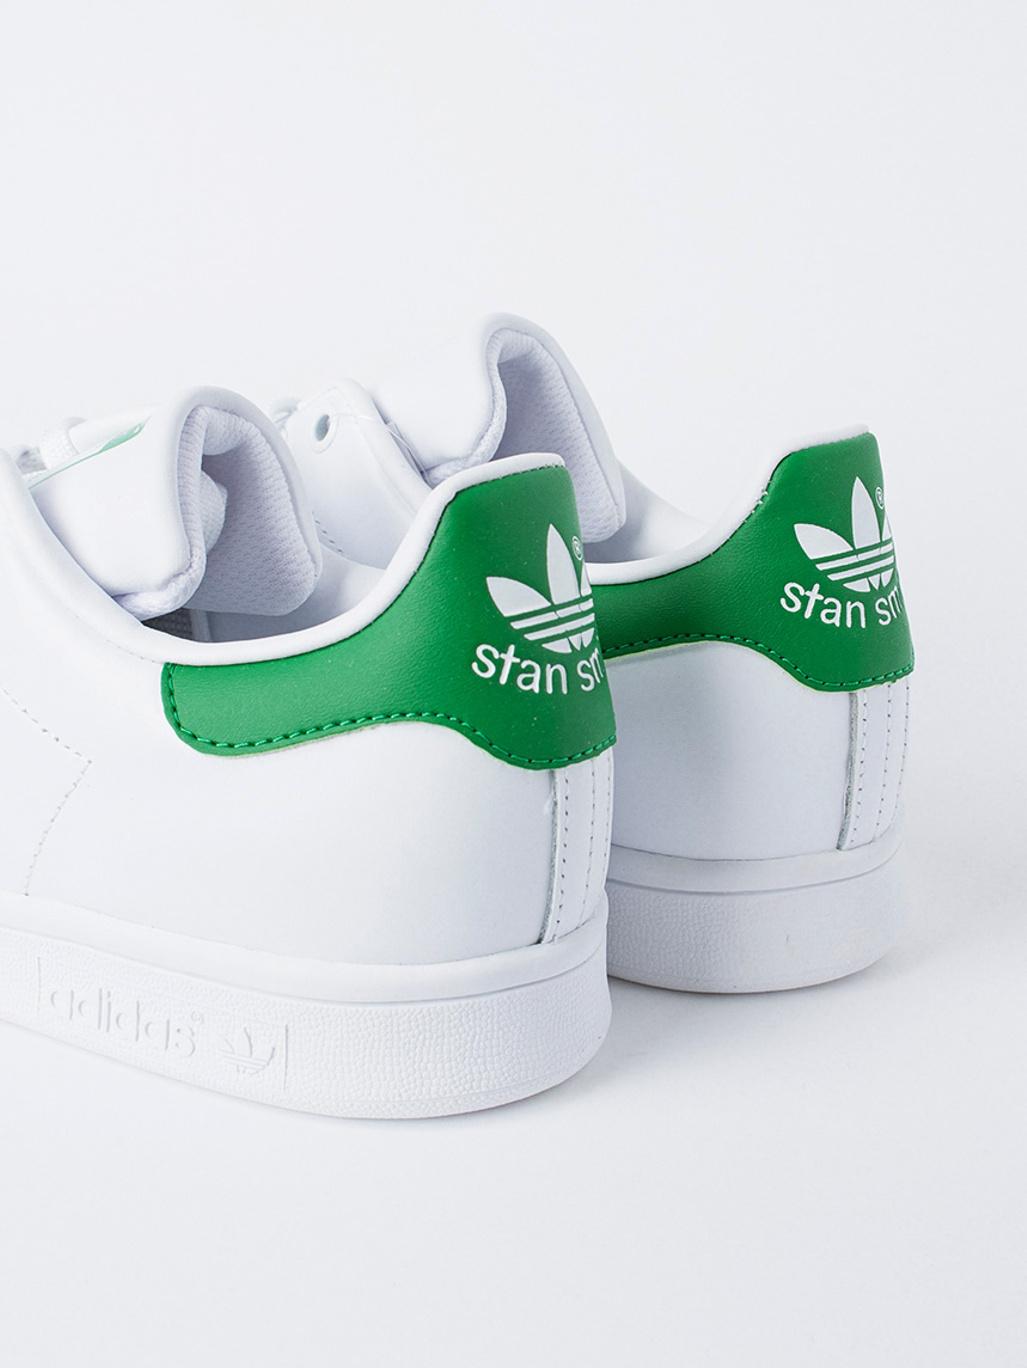 promo code 94175 4cb73 Stan Smith WhiteGreen - Adidas Originals - APLACE Fashion Store  Magazine